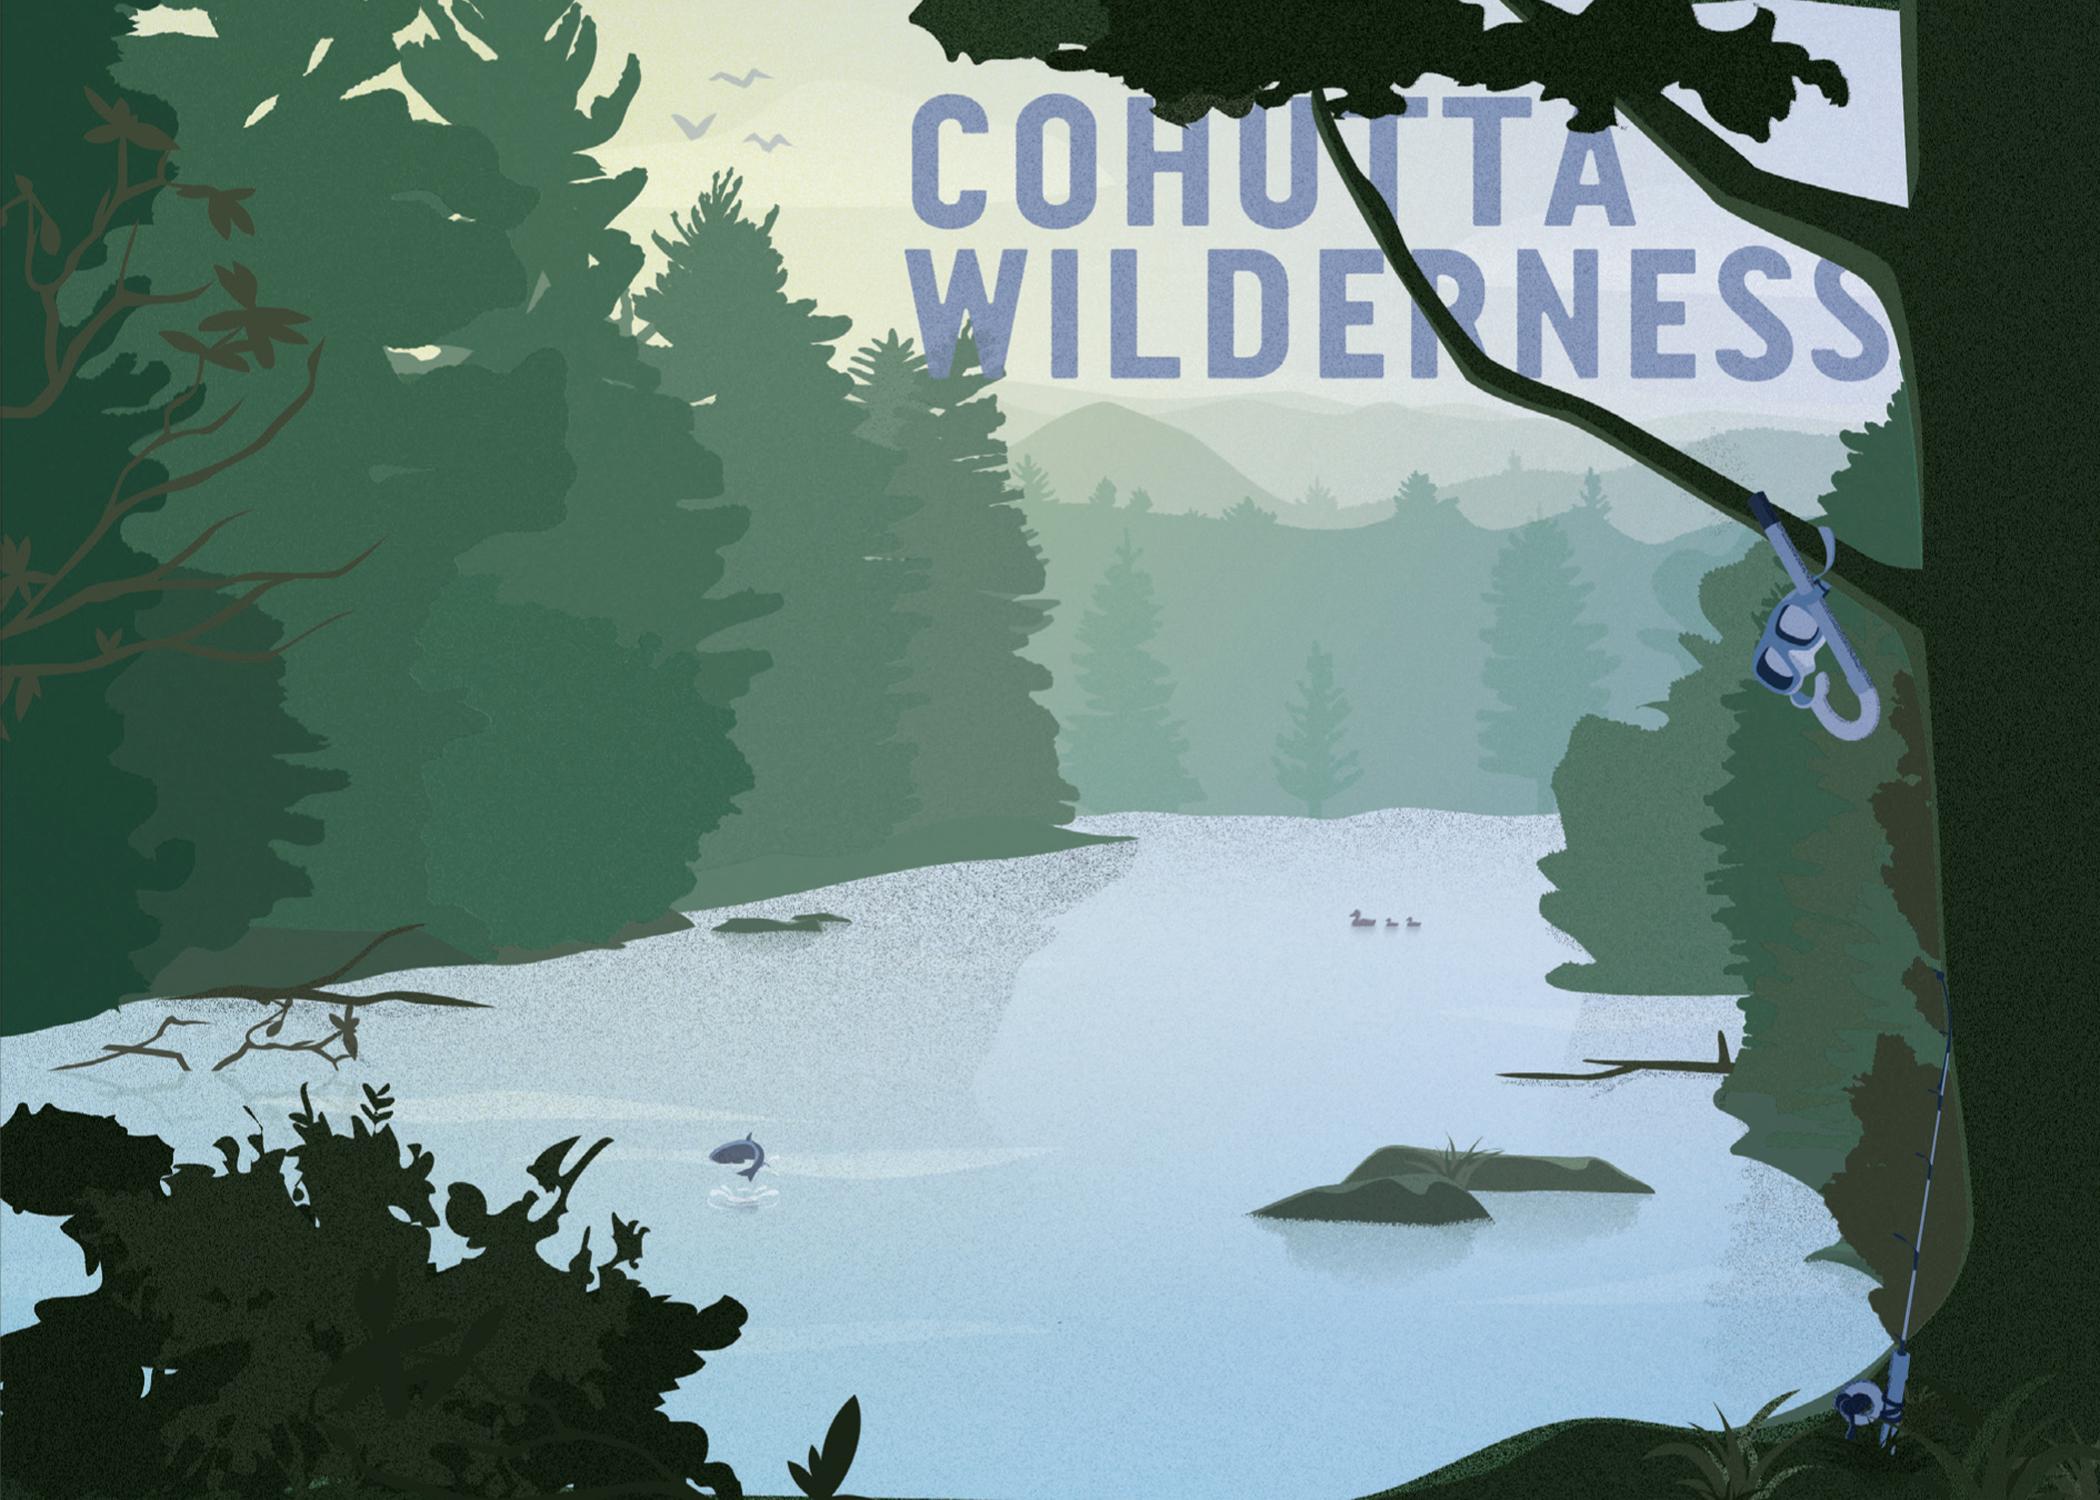 Precious Places Postcard - Cohutta Wilderness.jpg